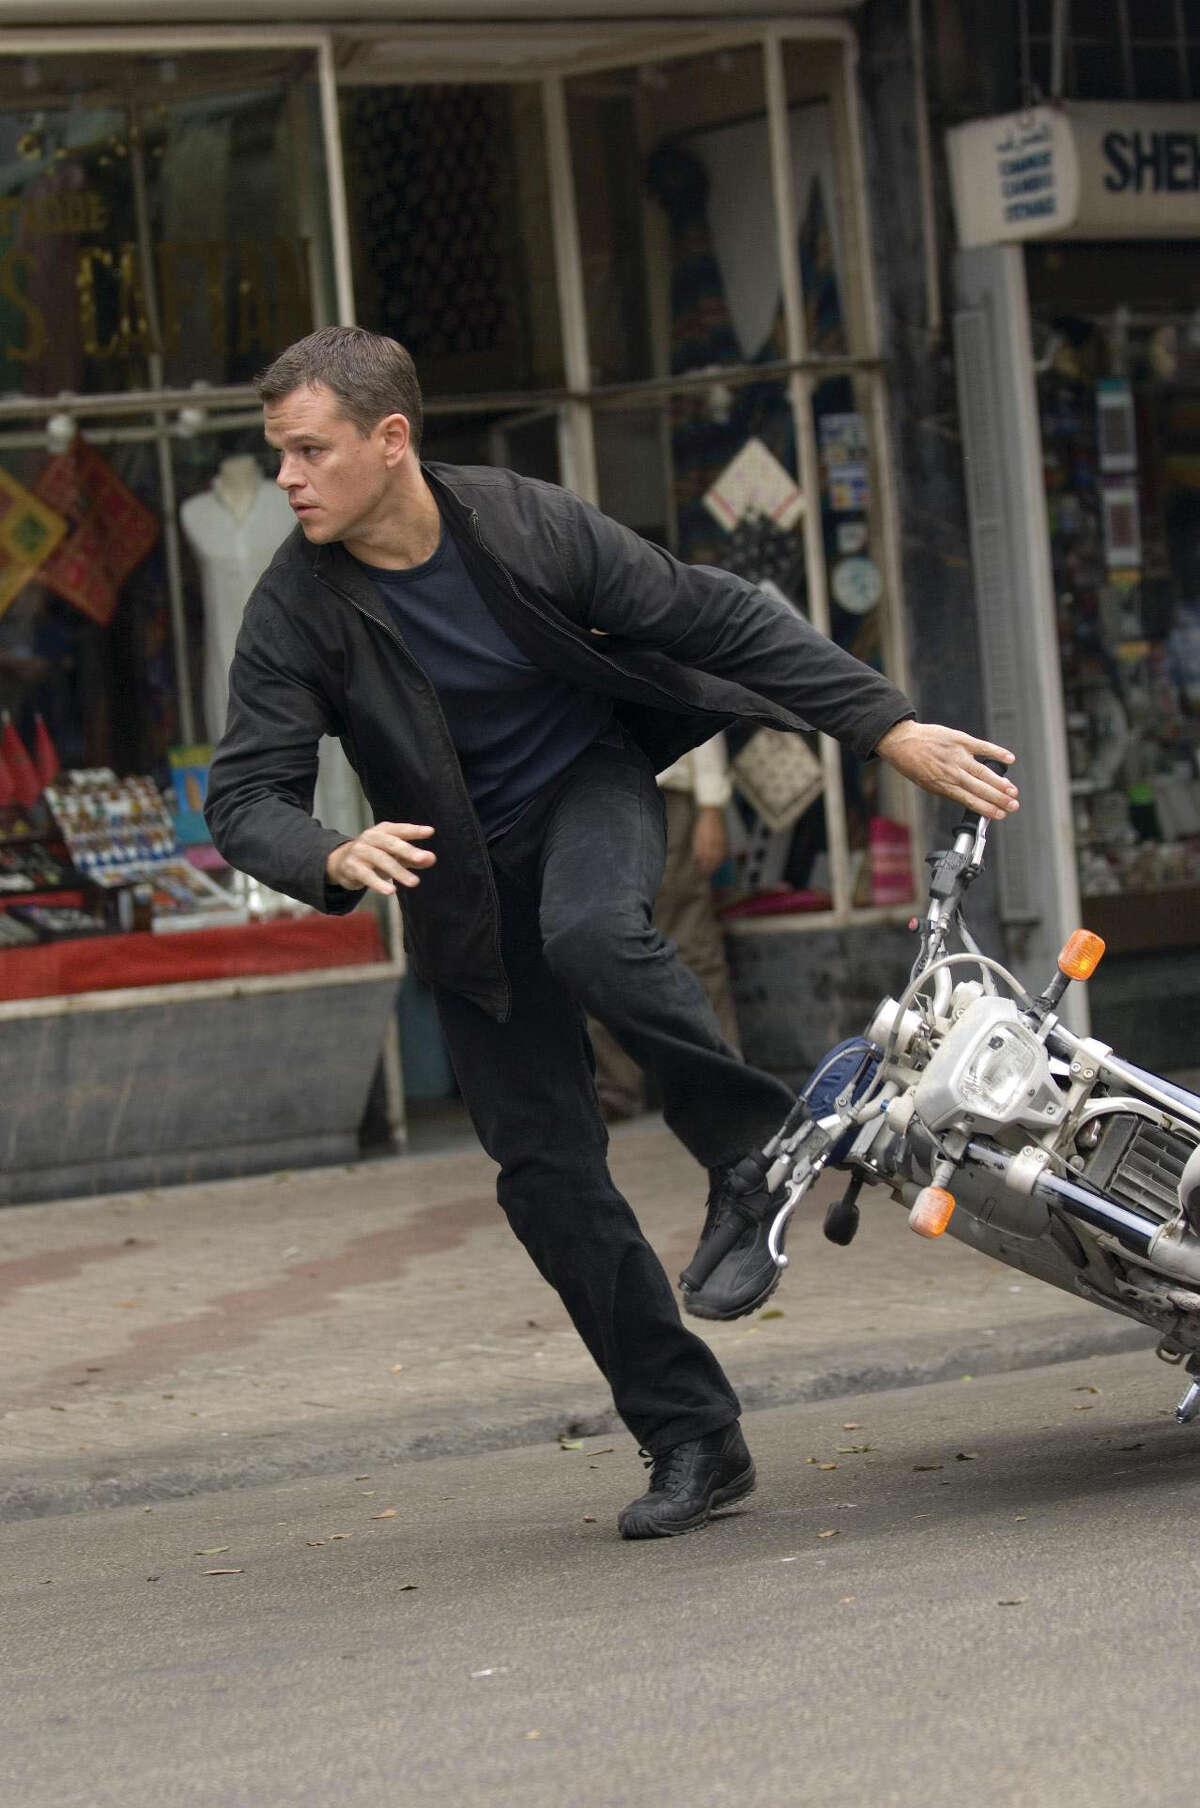 Action Adventure: 1365Pictured: Matt Damon in